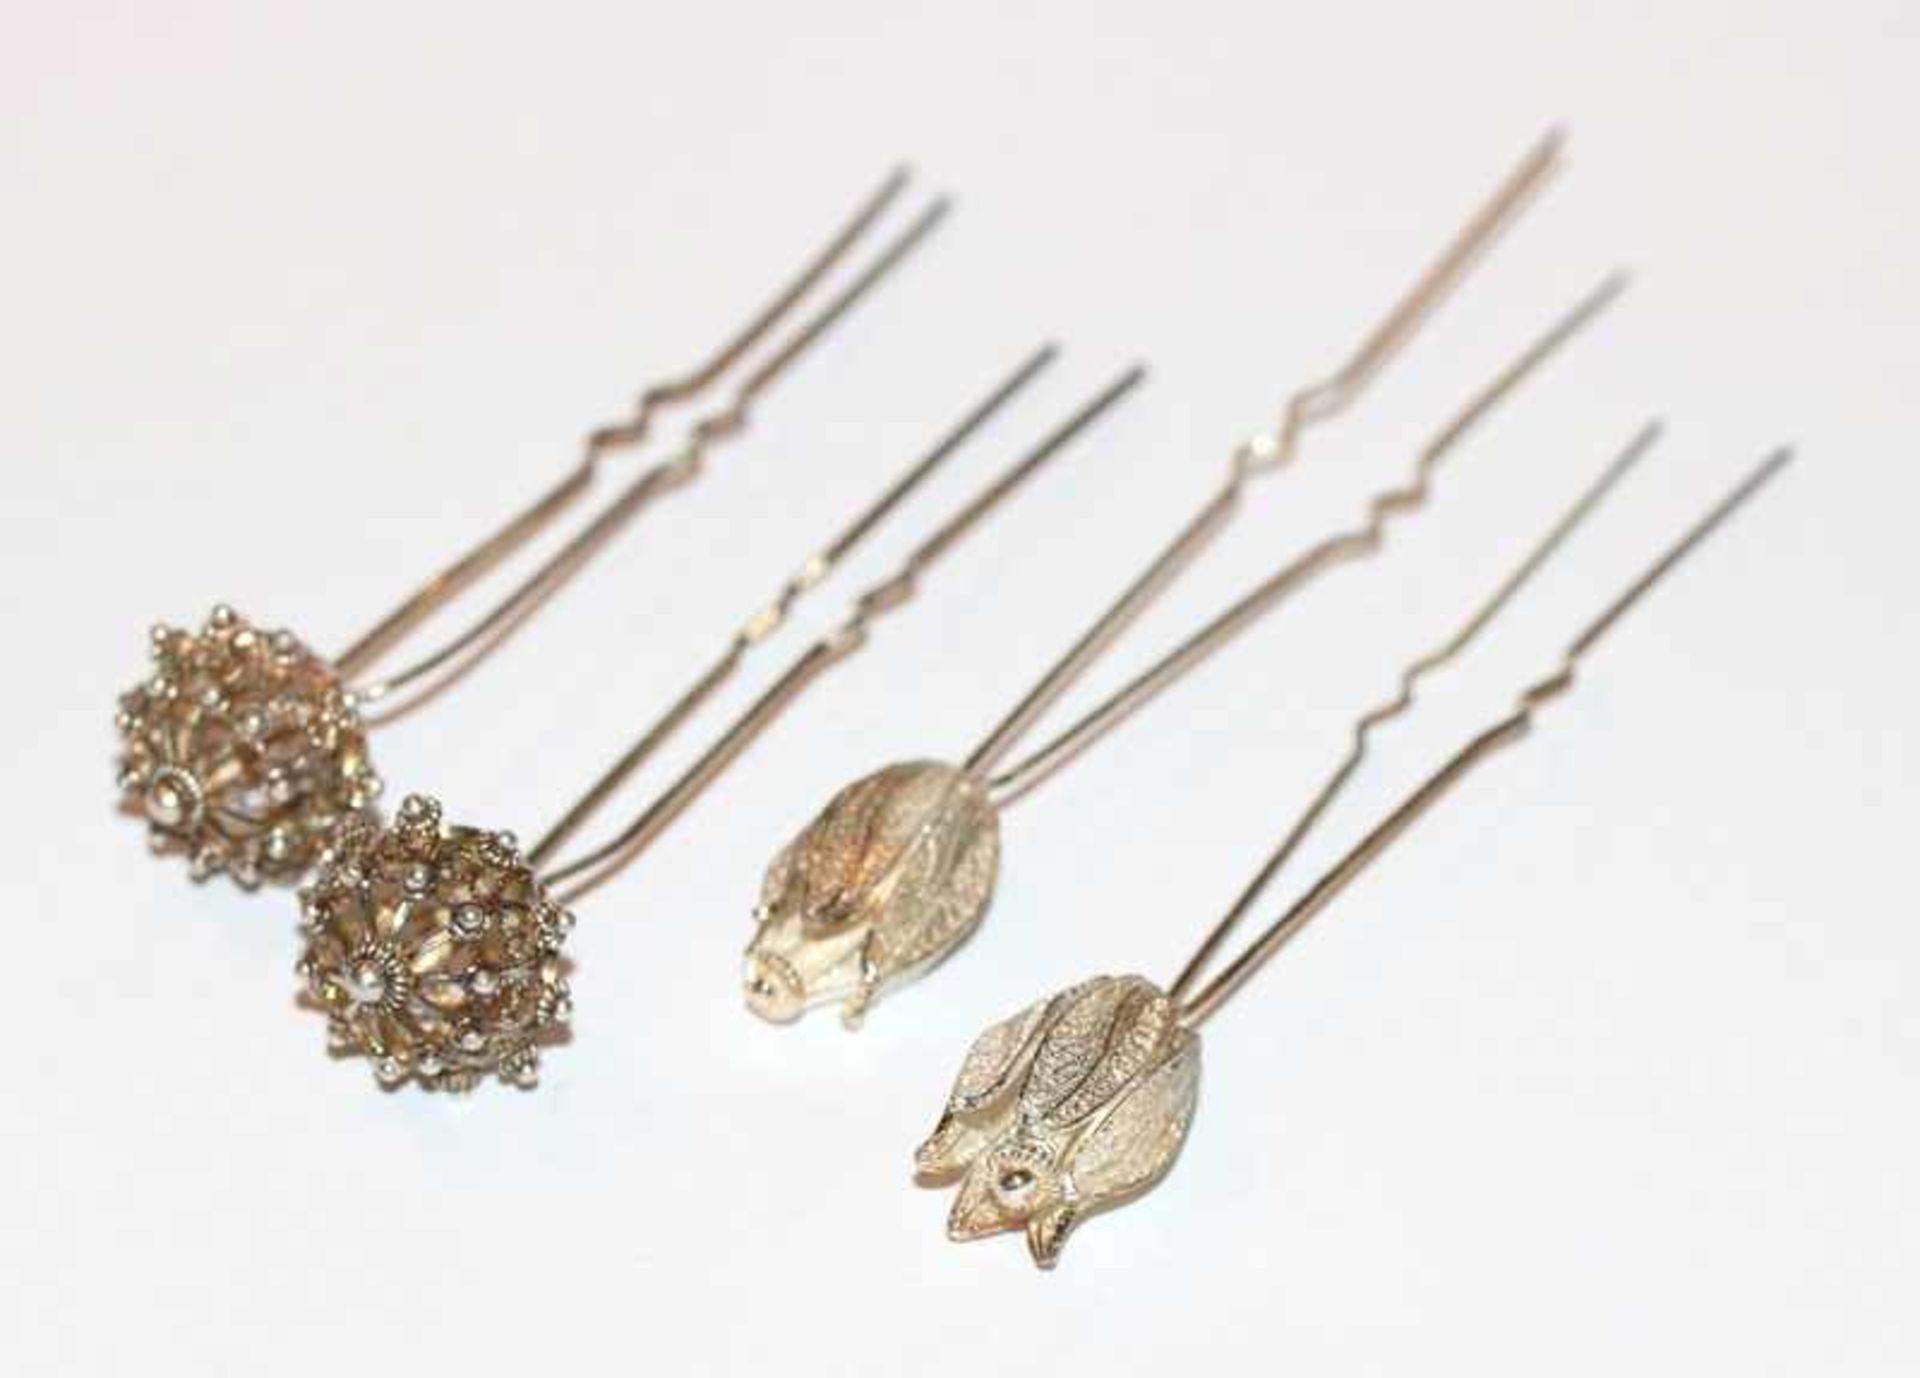 Los 22 - 4 Silber Haarnadeln in 2 Dekoren, filigrane Handarbeit, L 10/10,5 cm